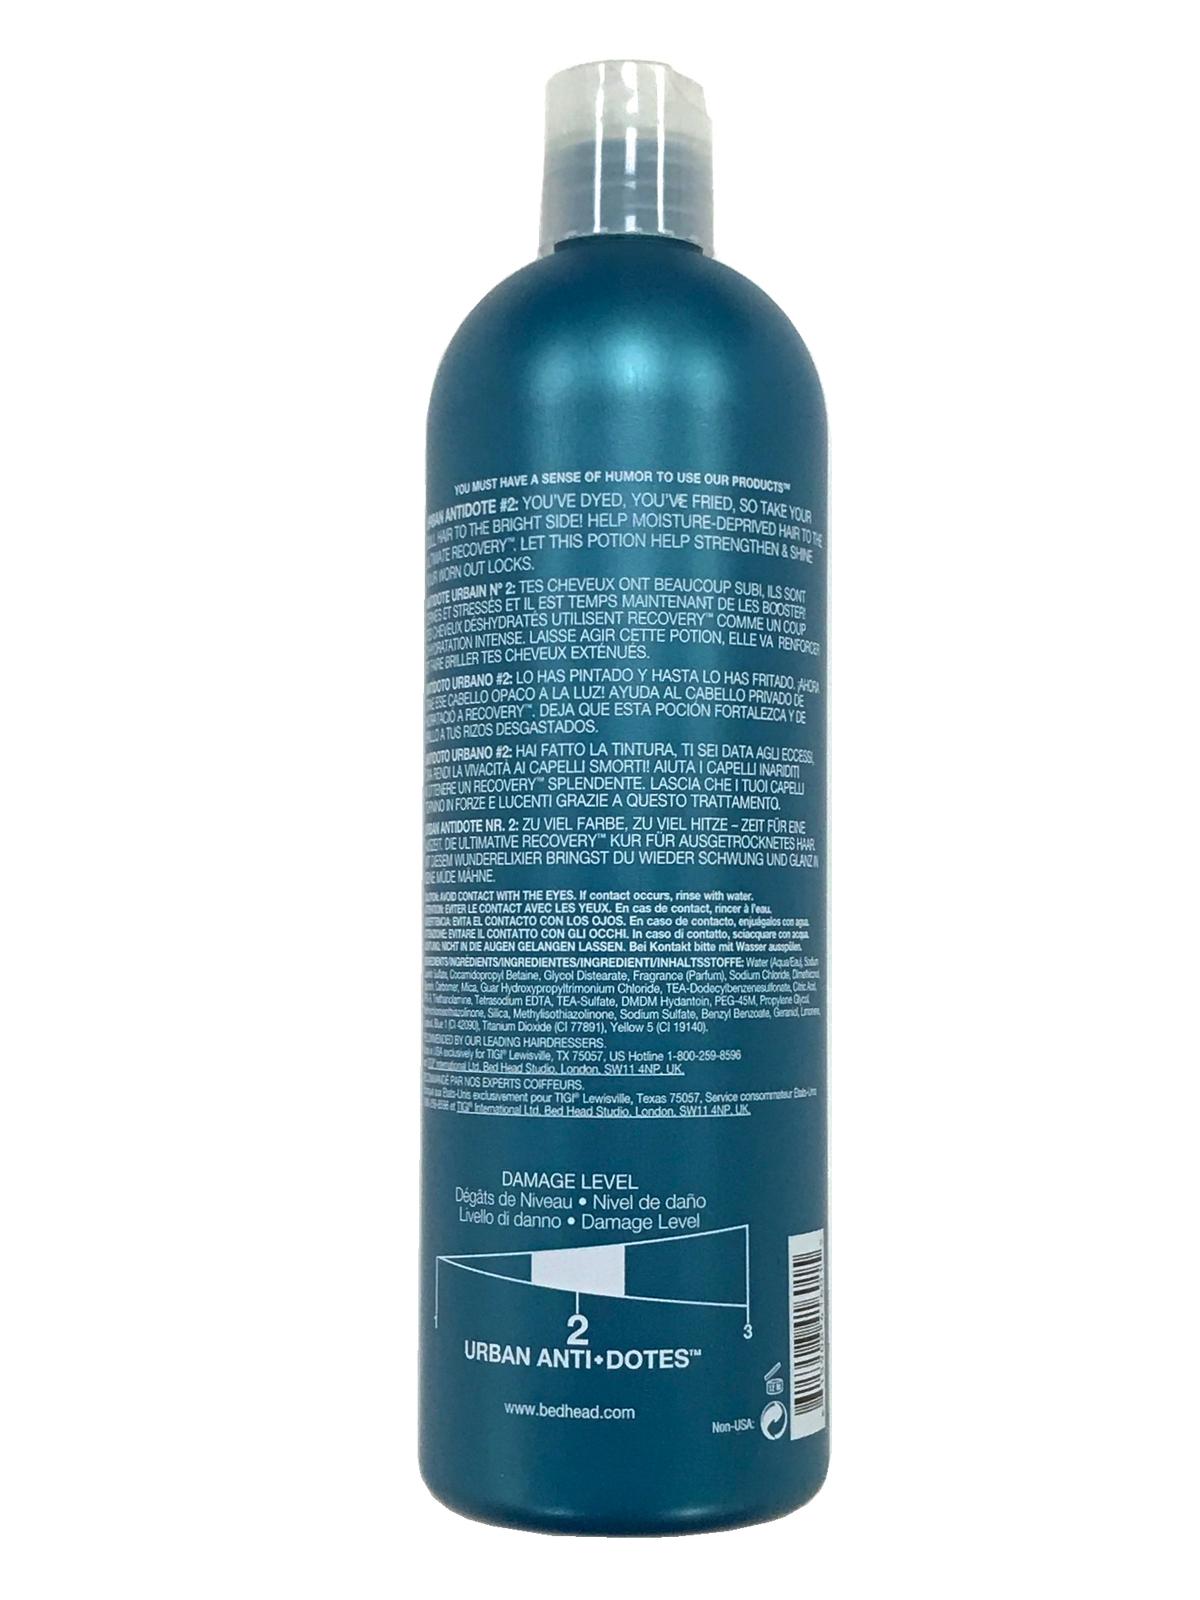 Bedhead shampoo 25.36oz 6015  1